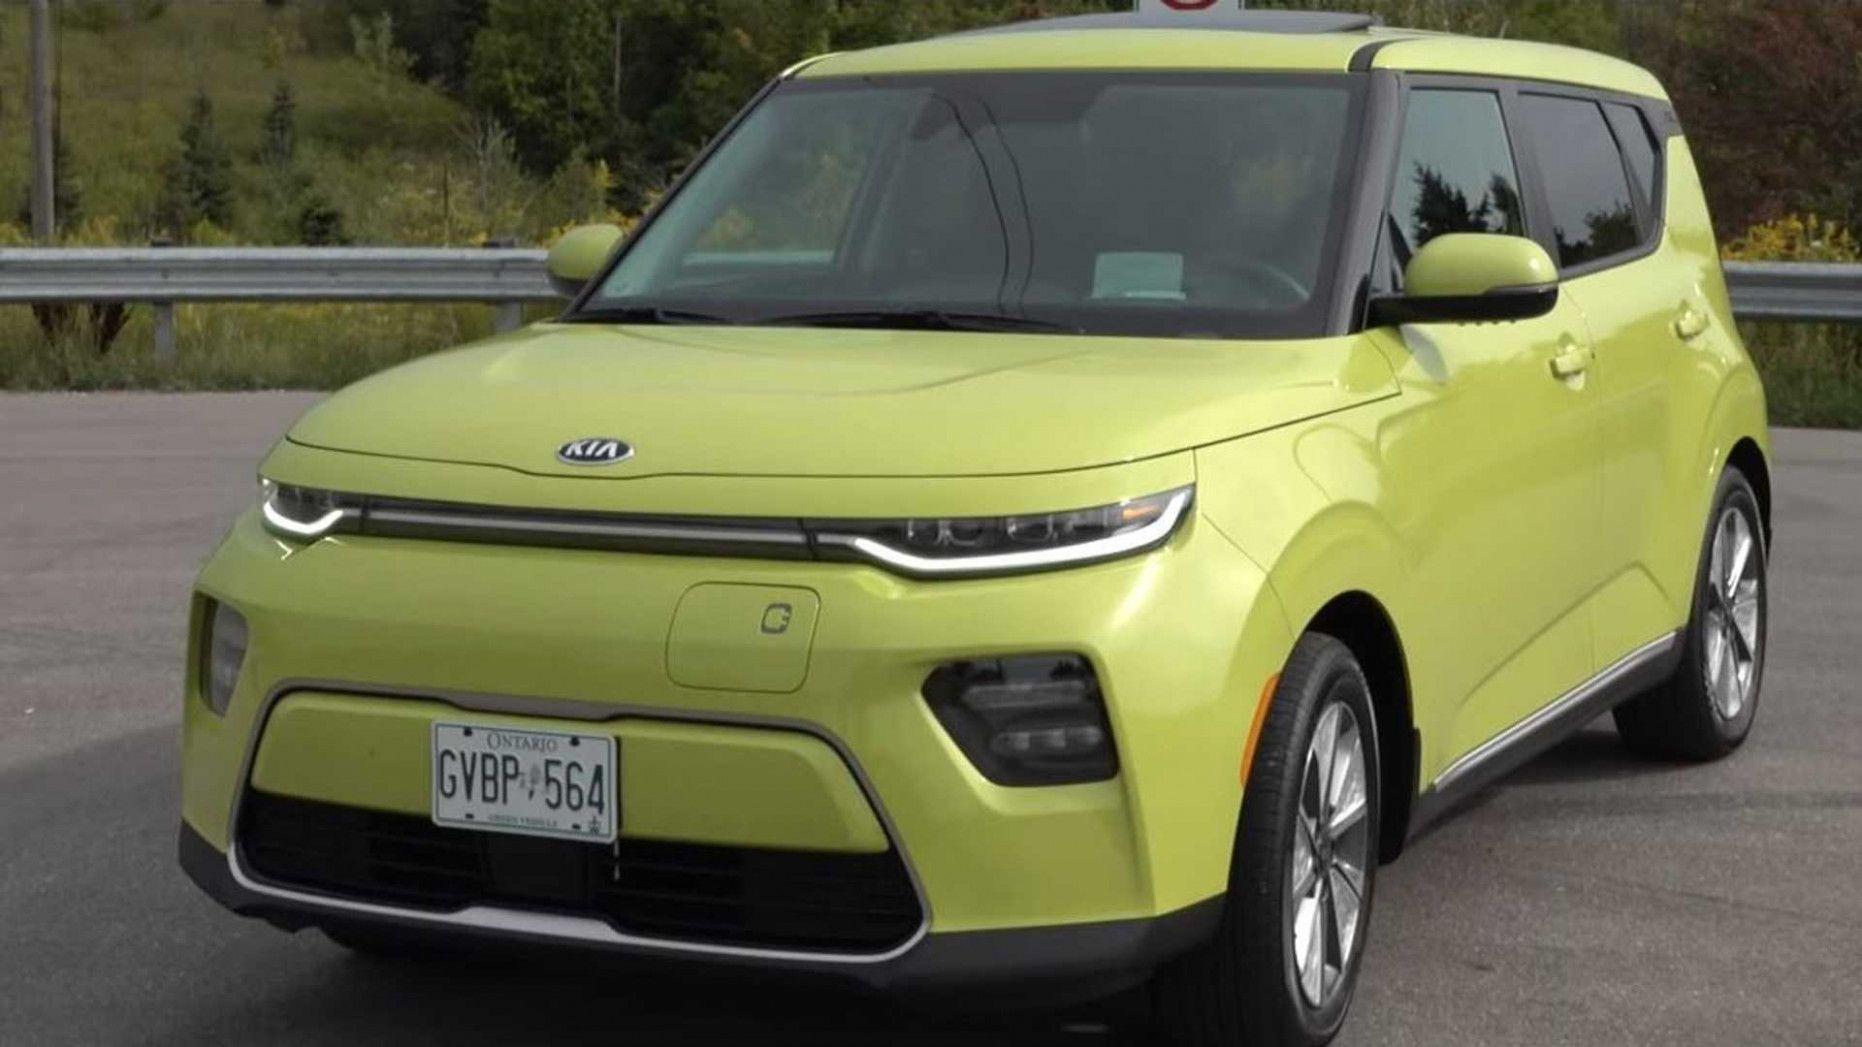 8 Wallpaper Kia Electric Vehicles 2020 in 2020 Kia, Kia